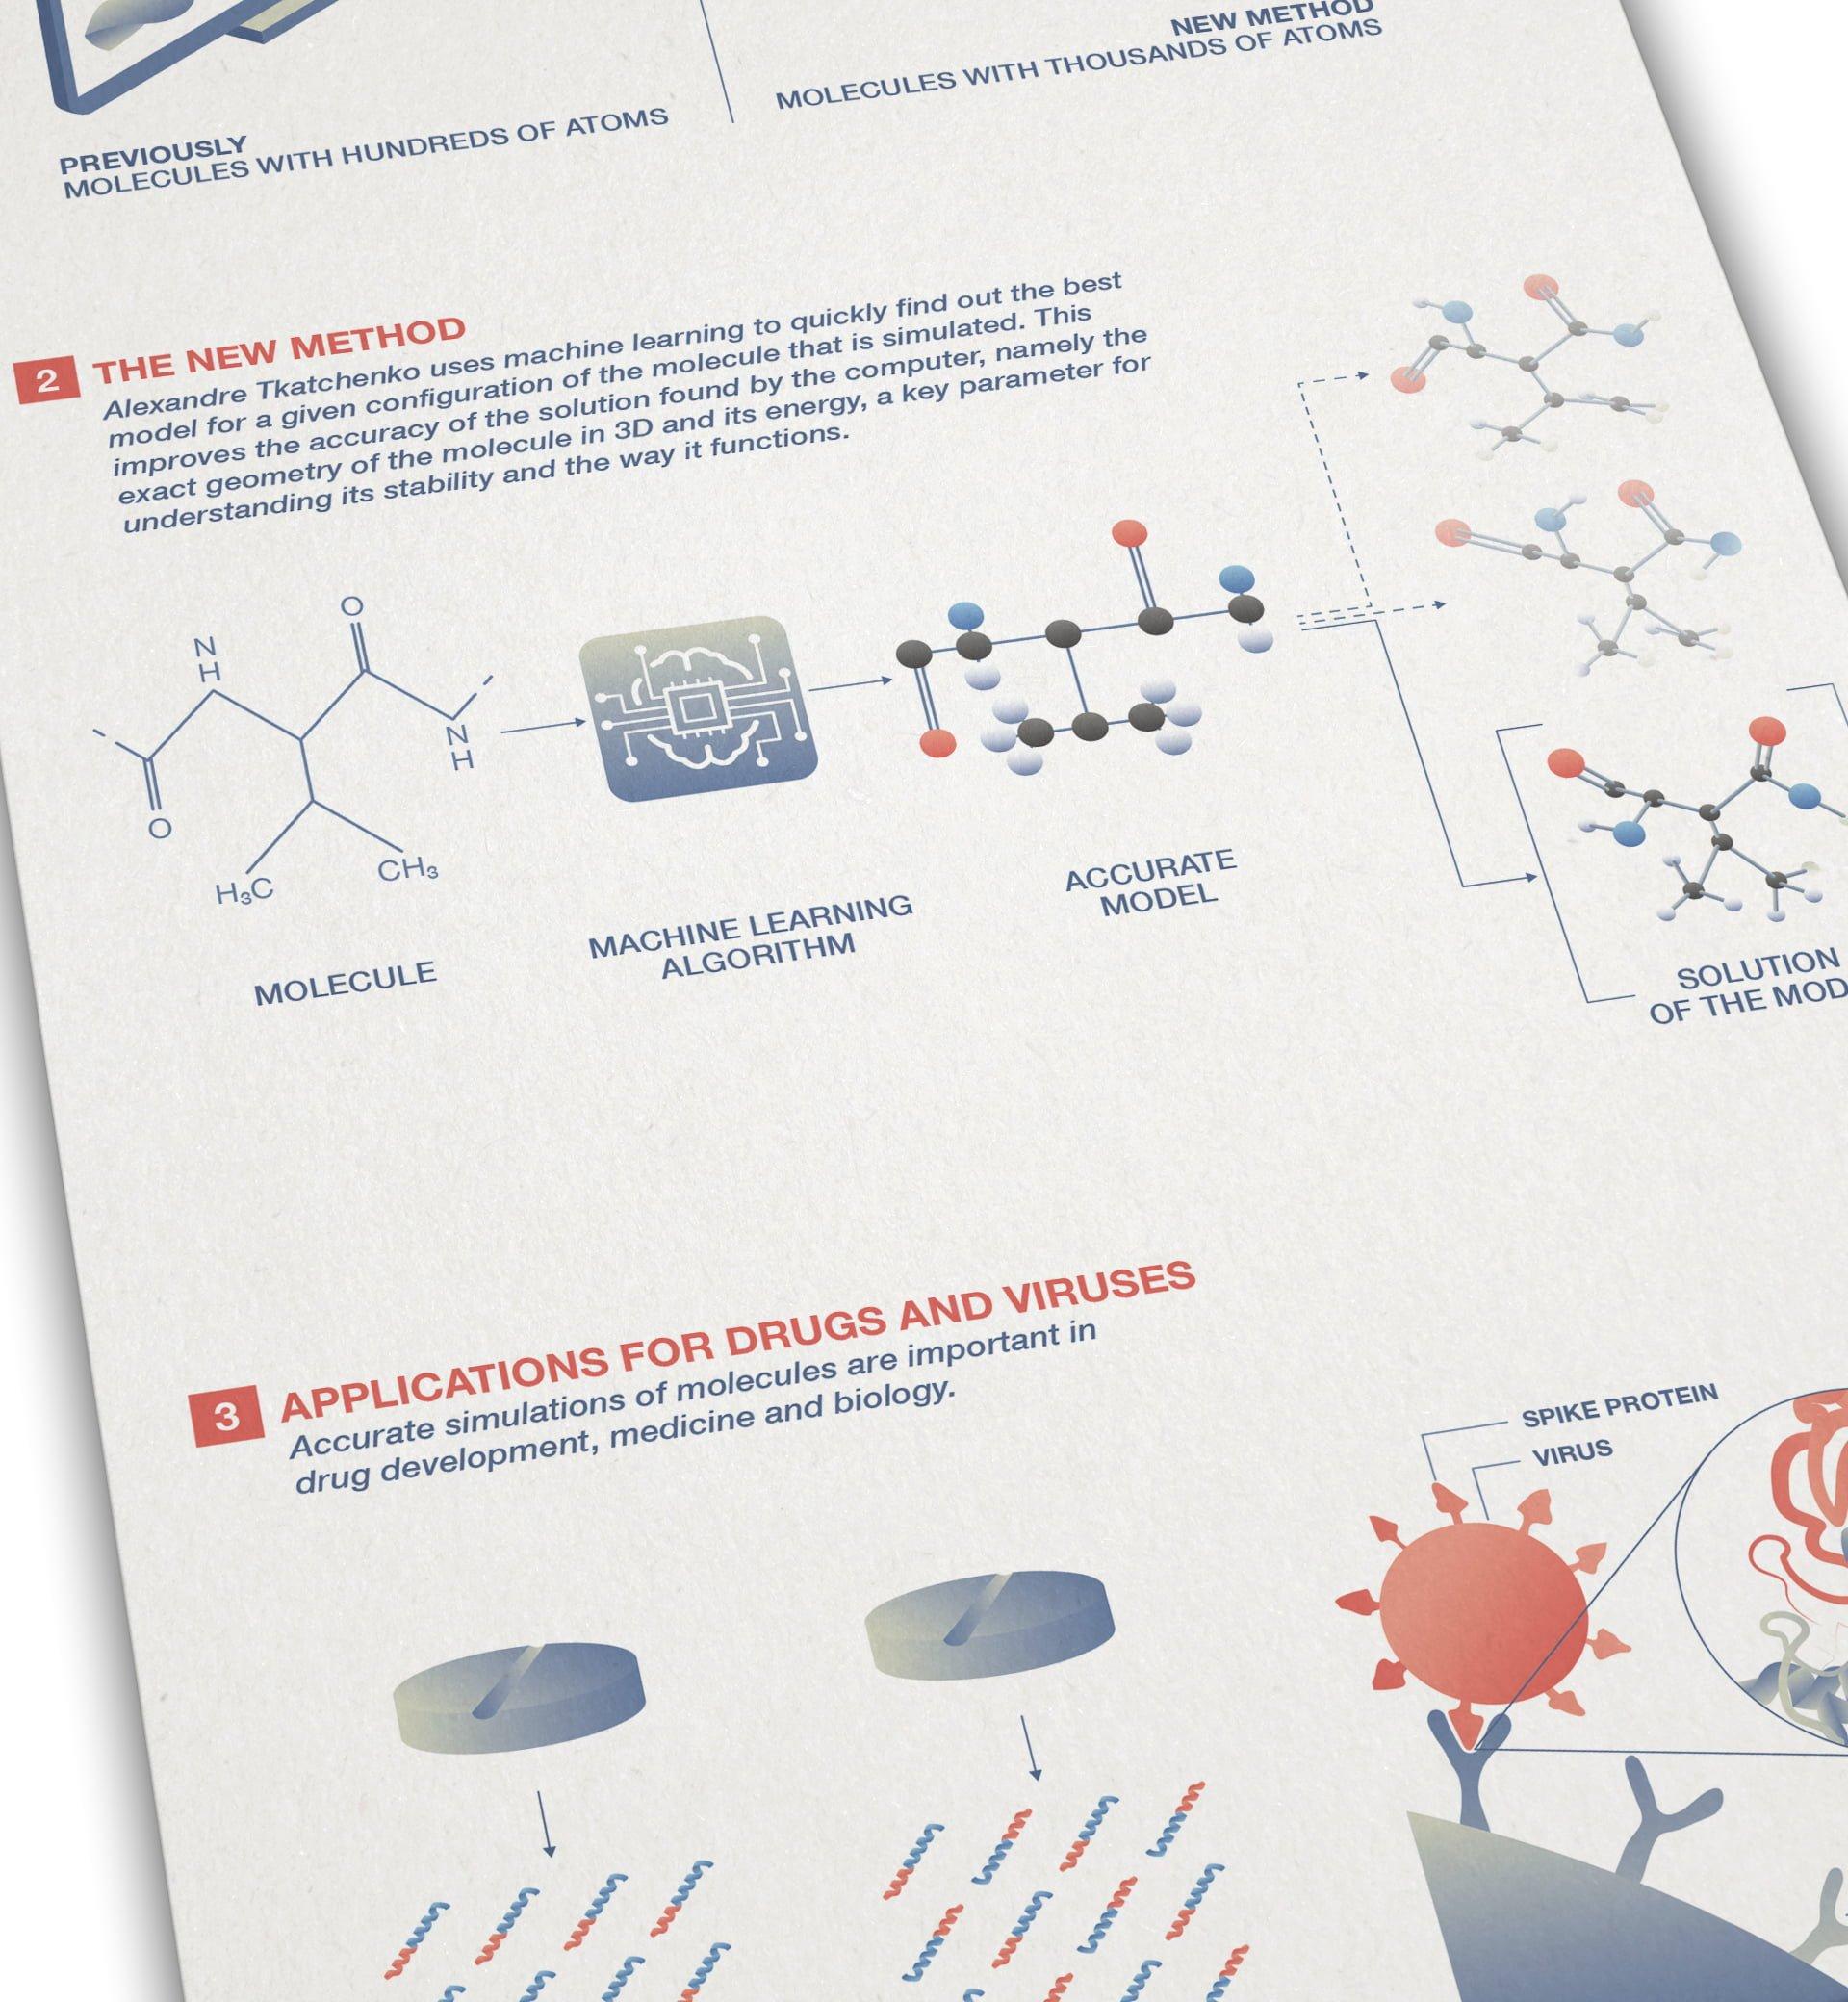 FNR infografik 2 molecules ikonaut